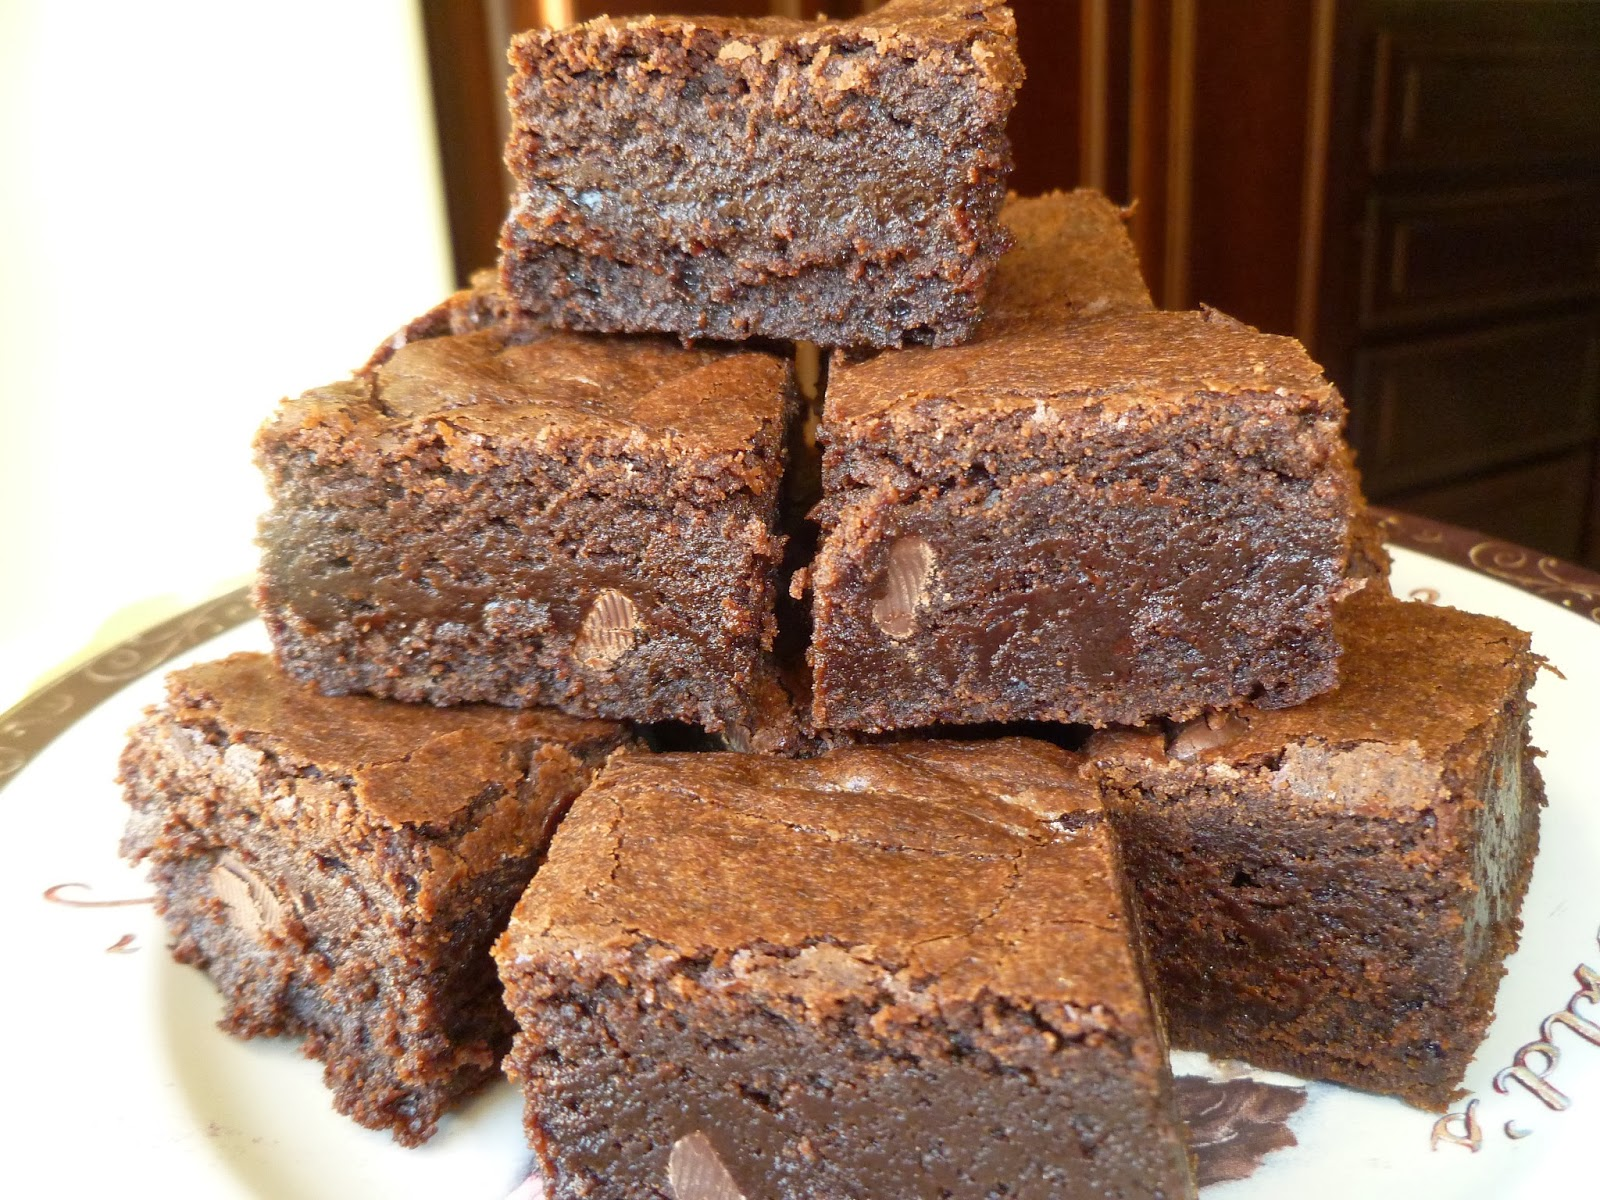 The Pastry Chef's Baking: Dark Chocolate Brownies